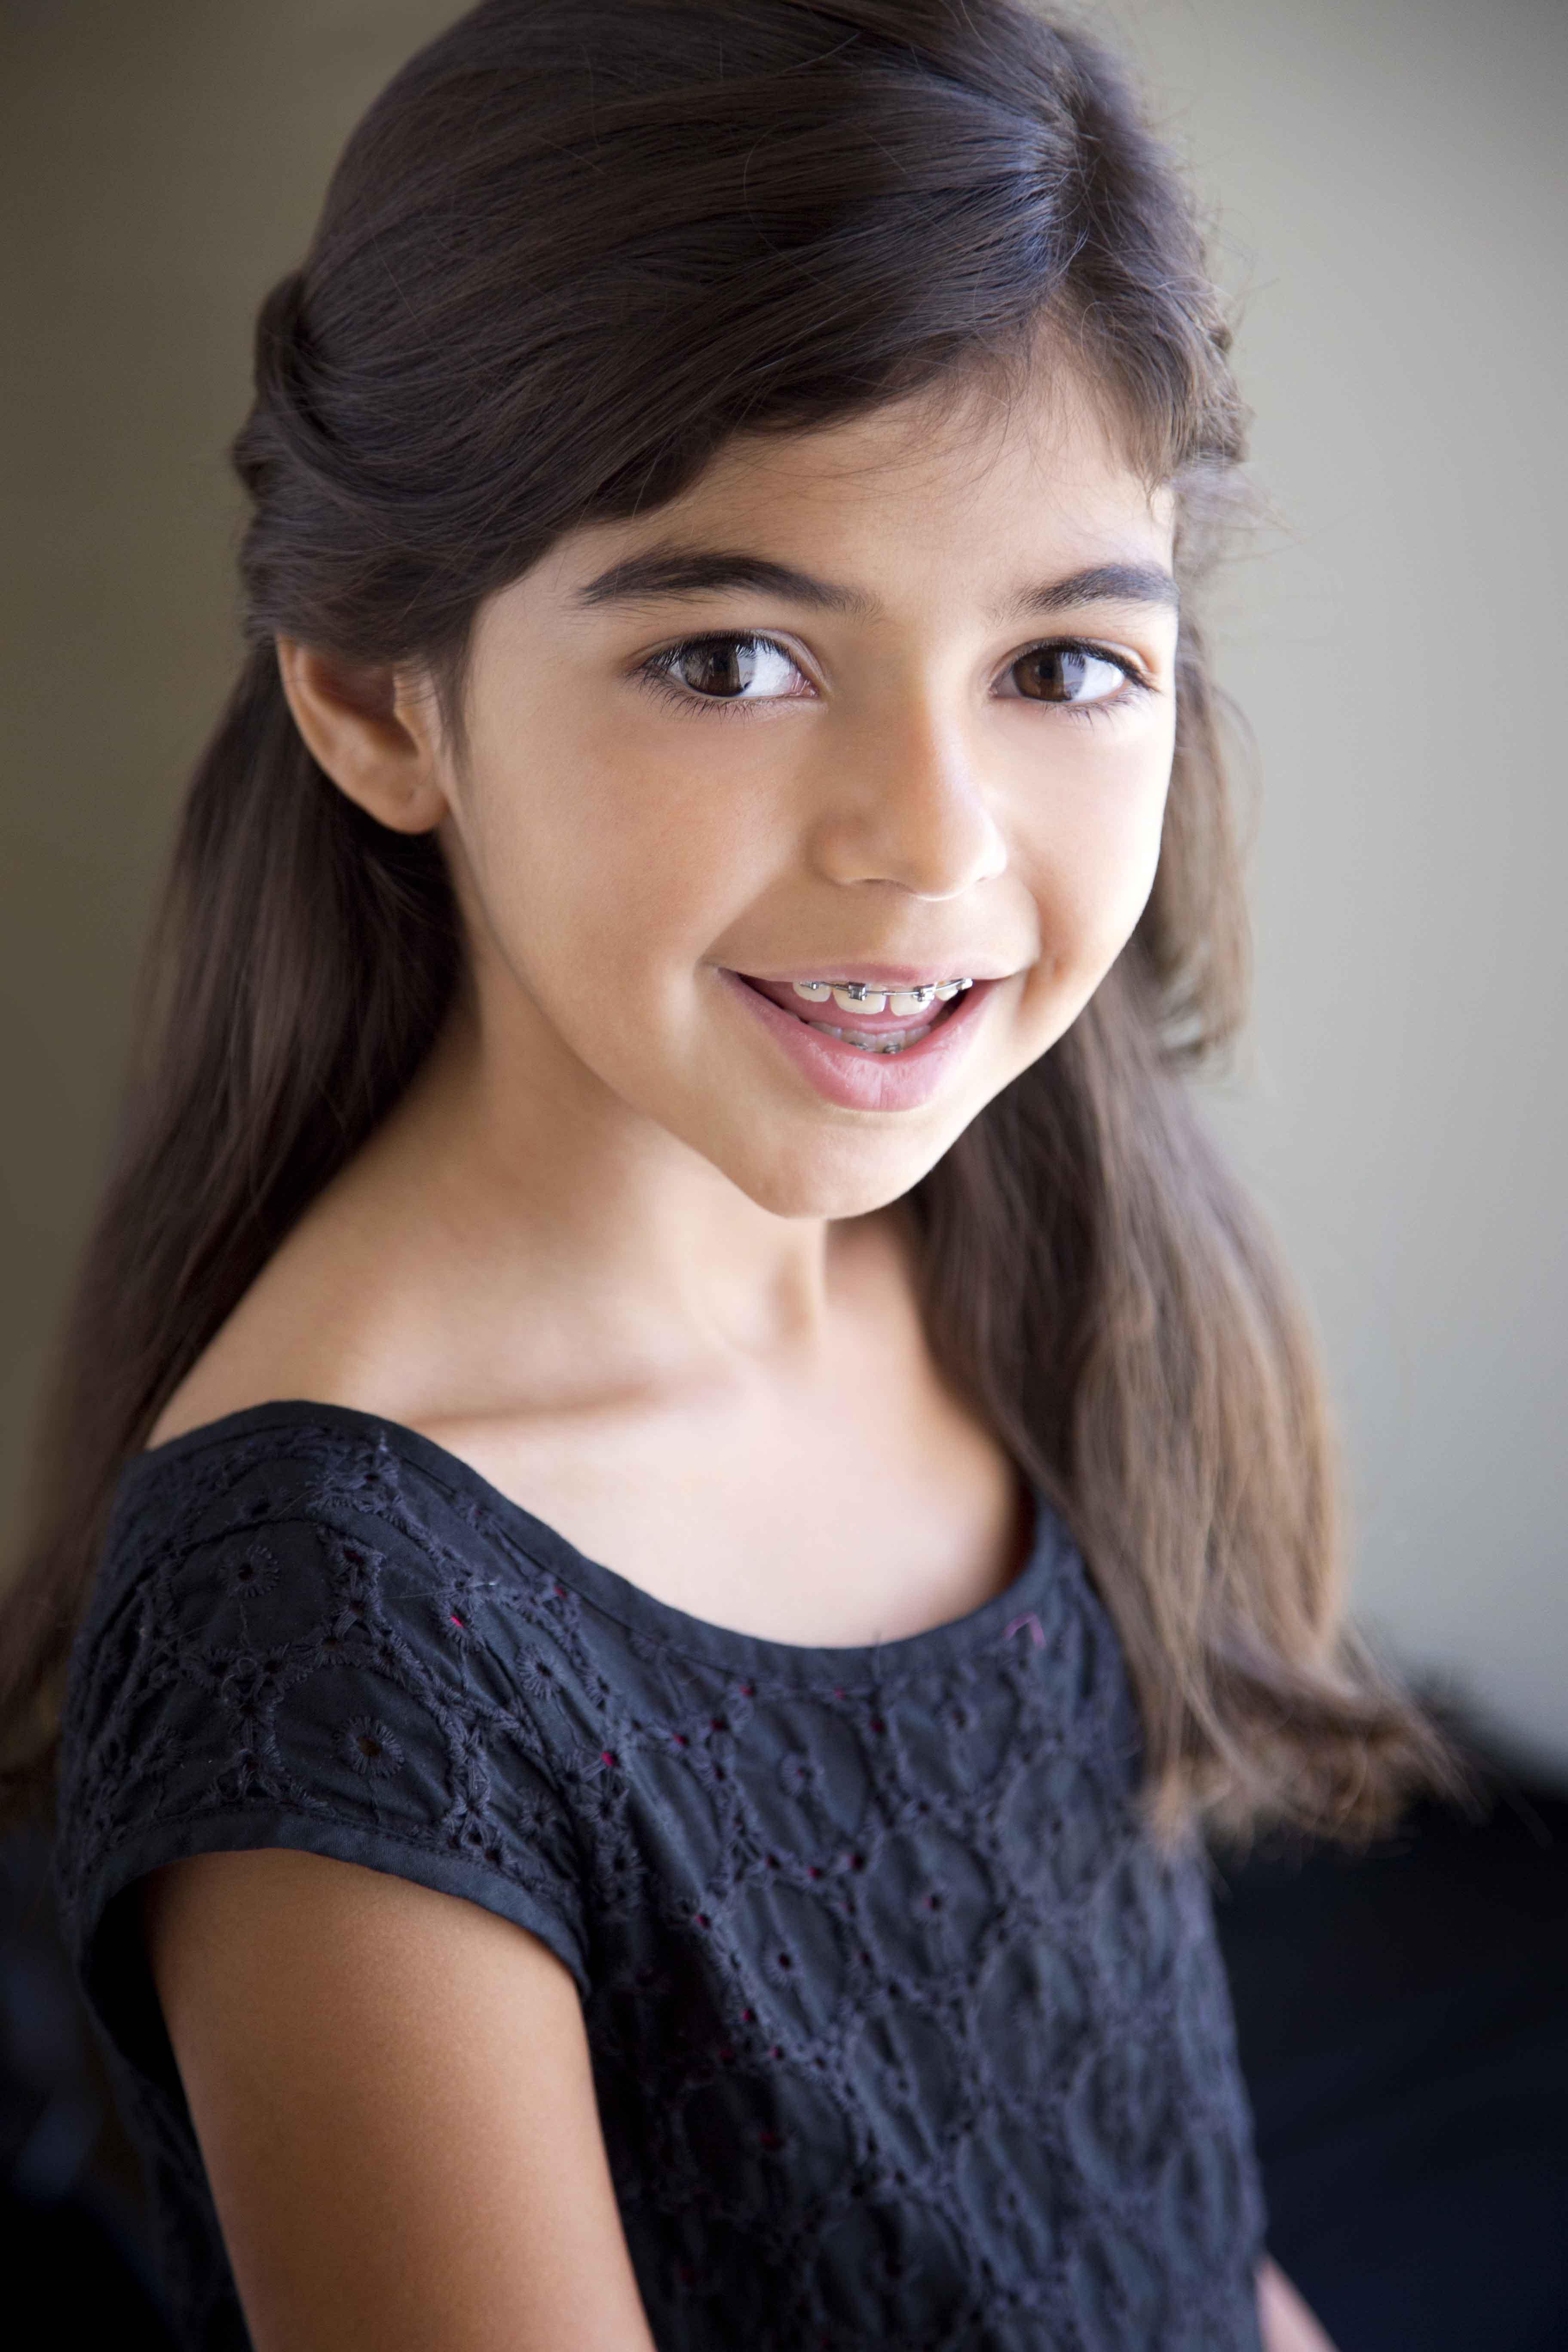 kids_modeling_headshot_photographer_amie_alvarado.jpg